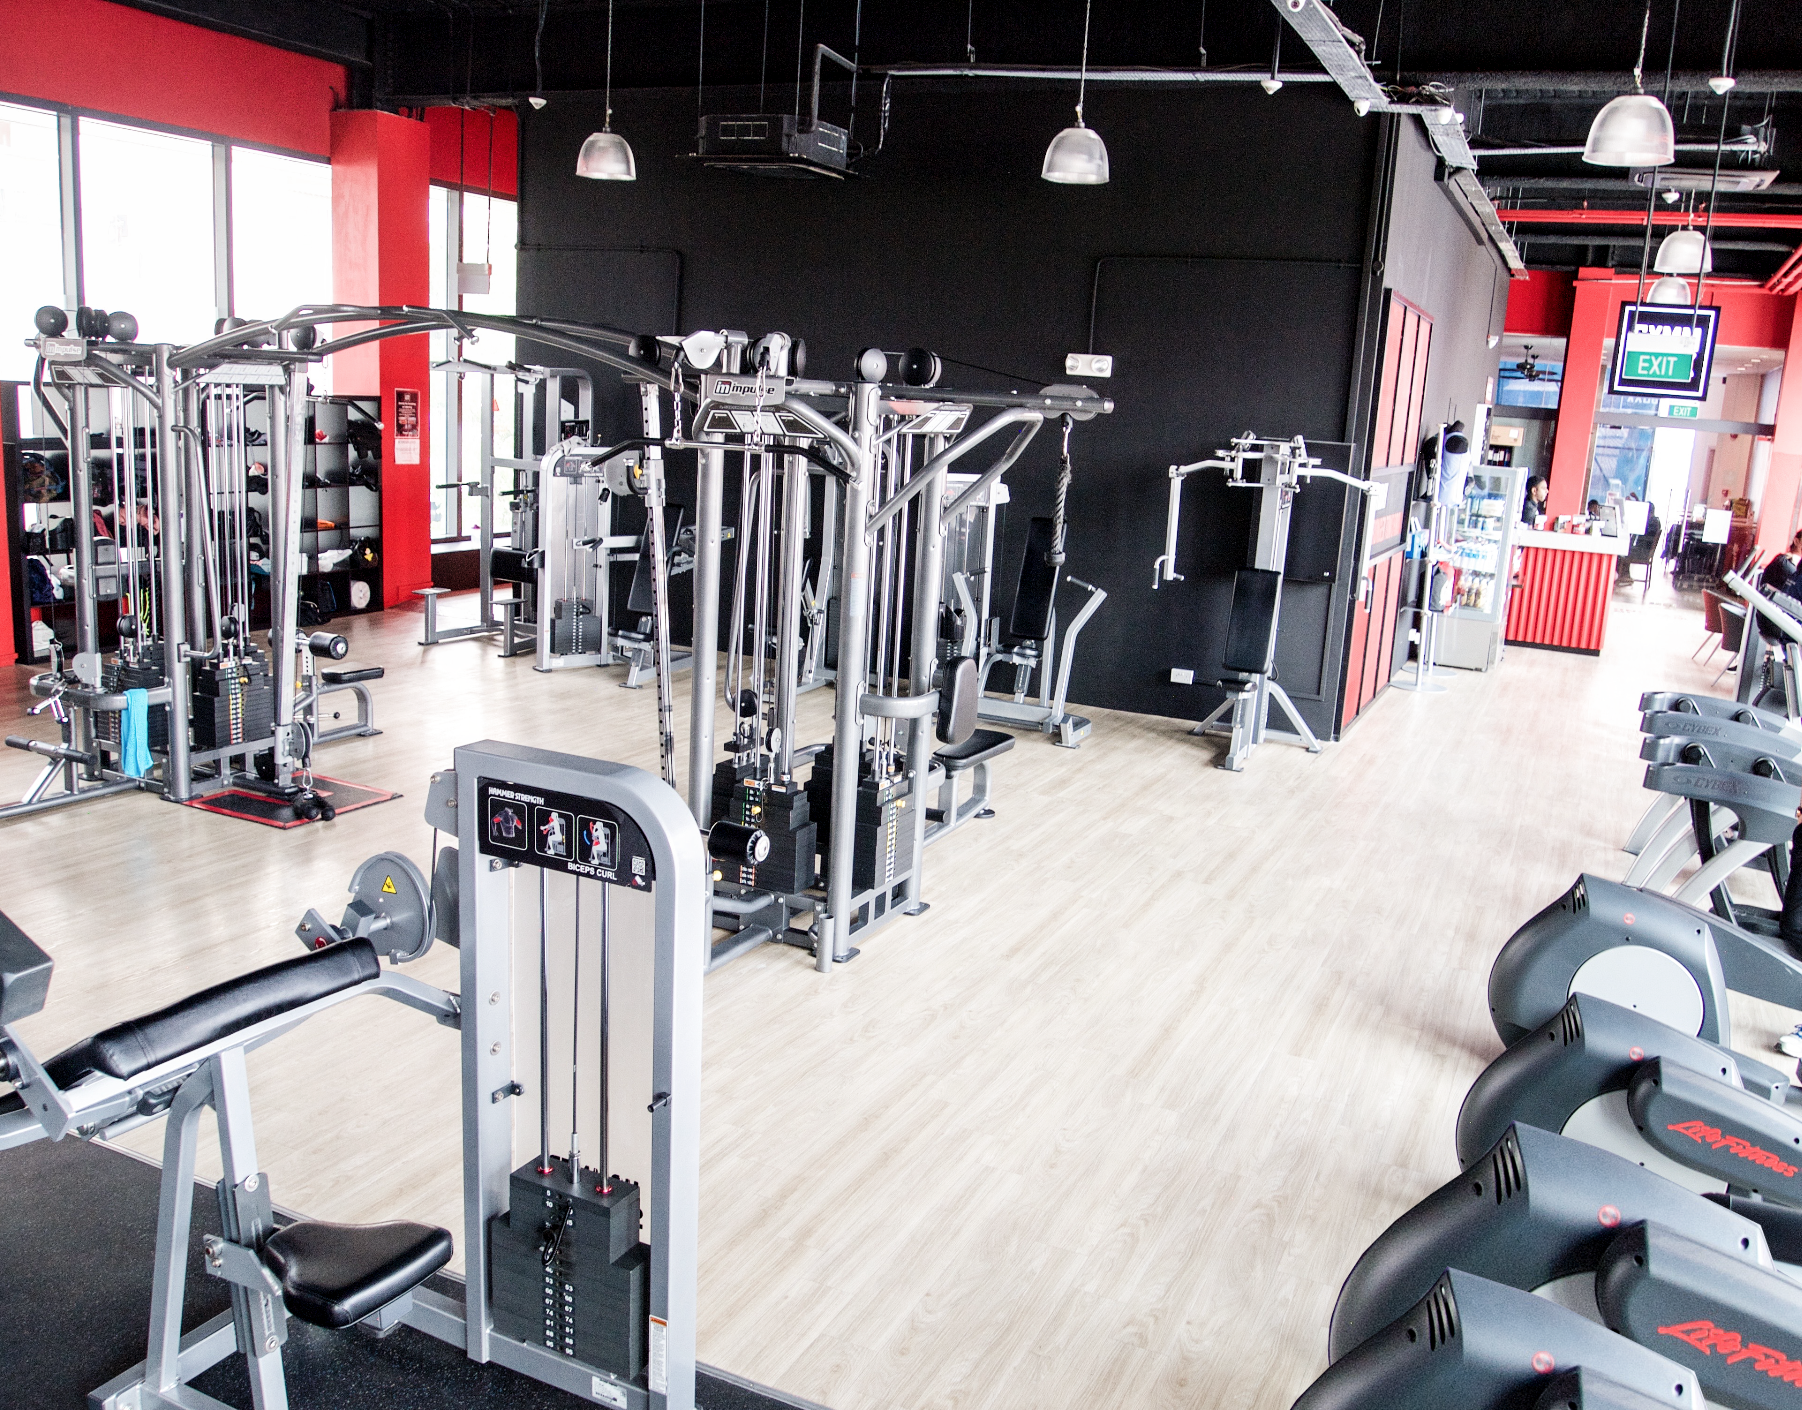 24 hour Gym at Bishan, Singapore